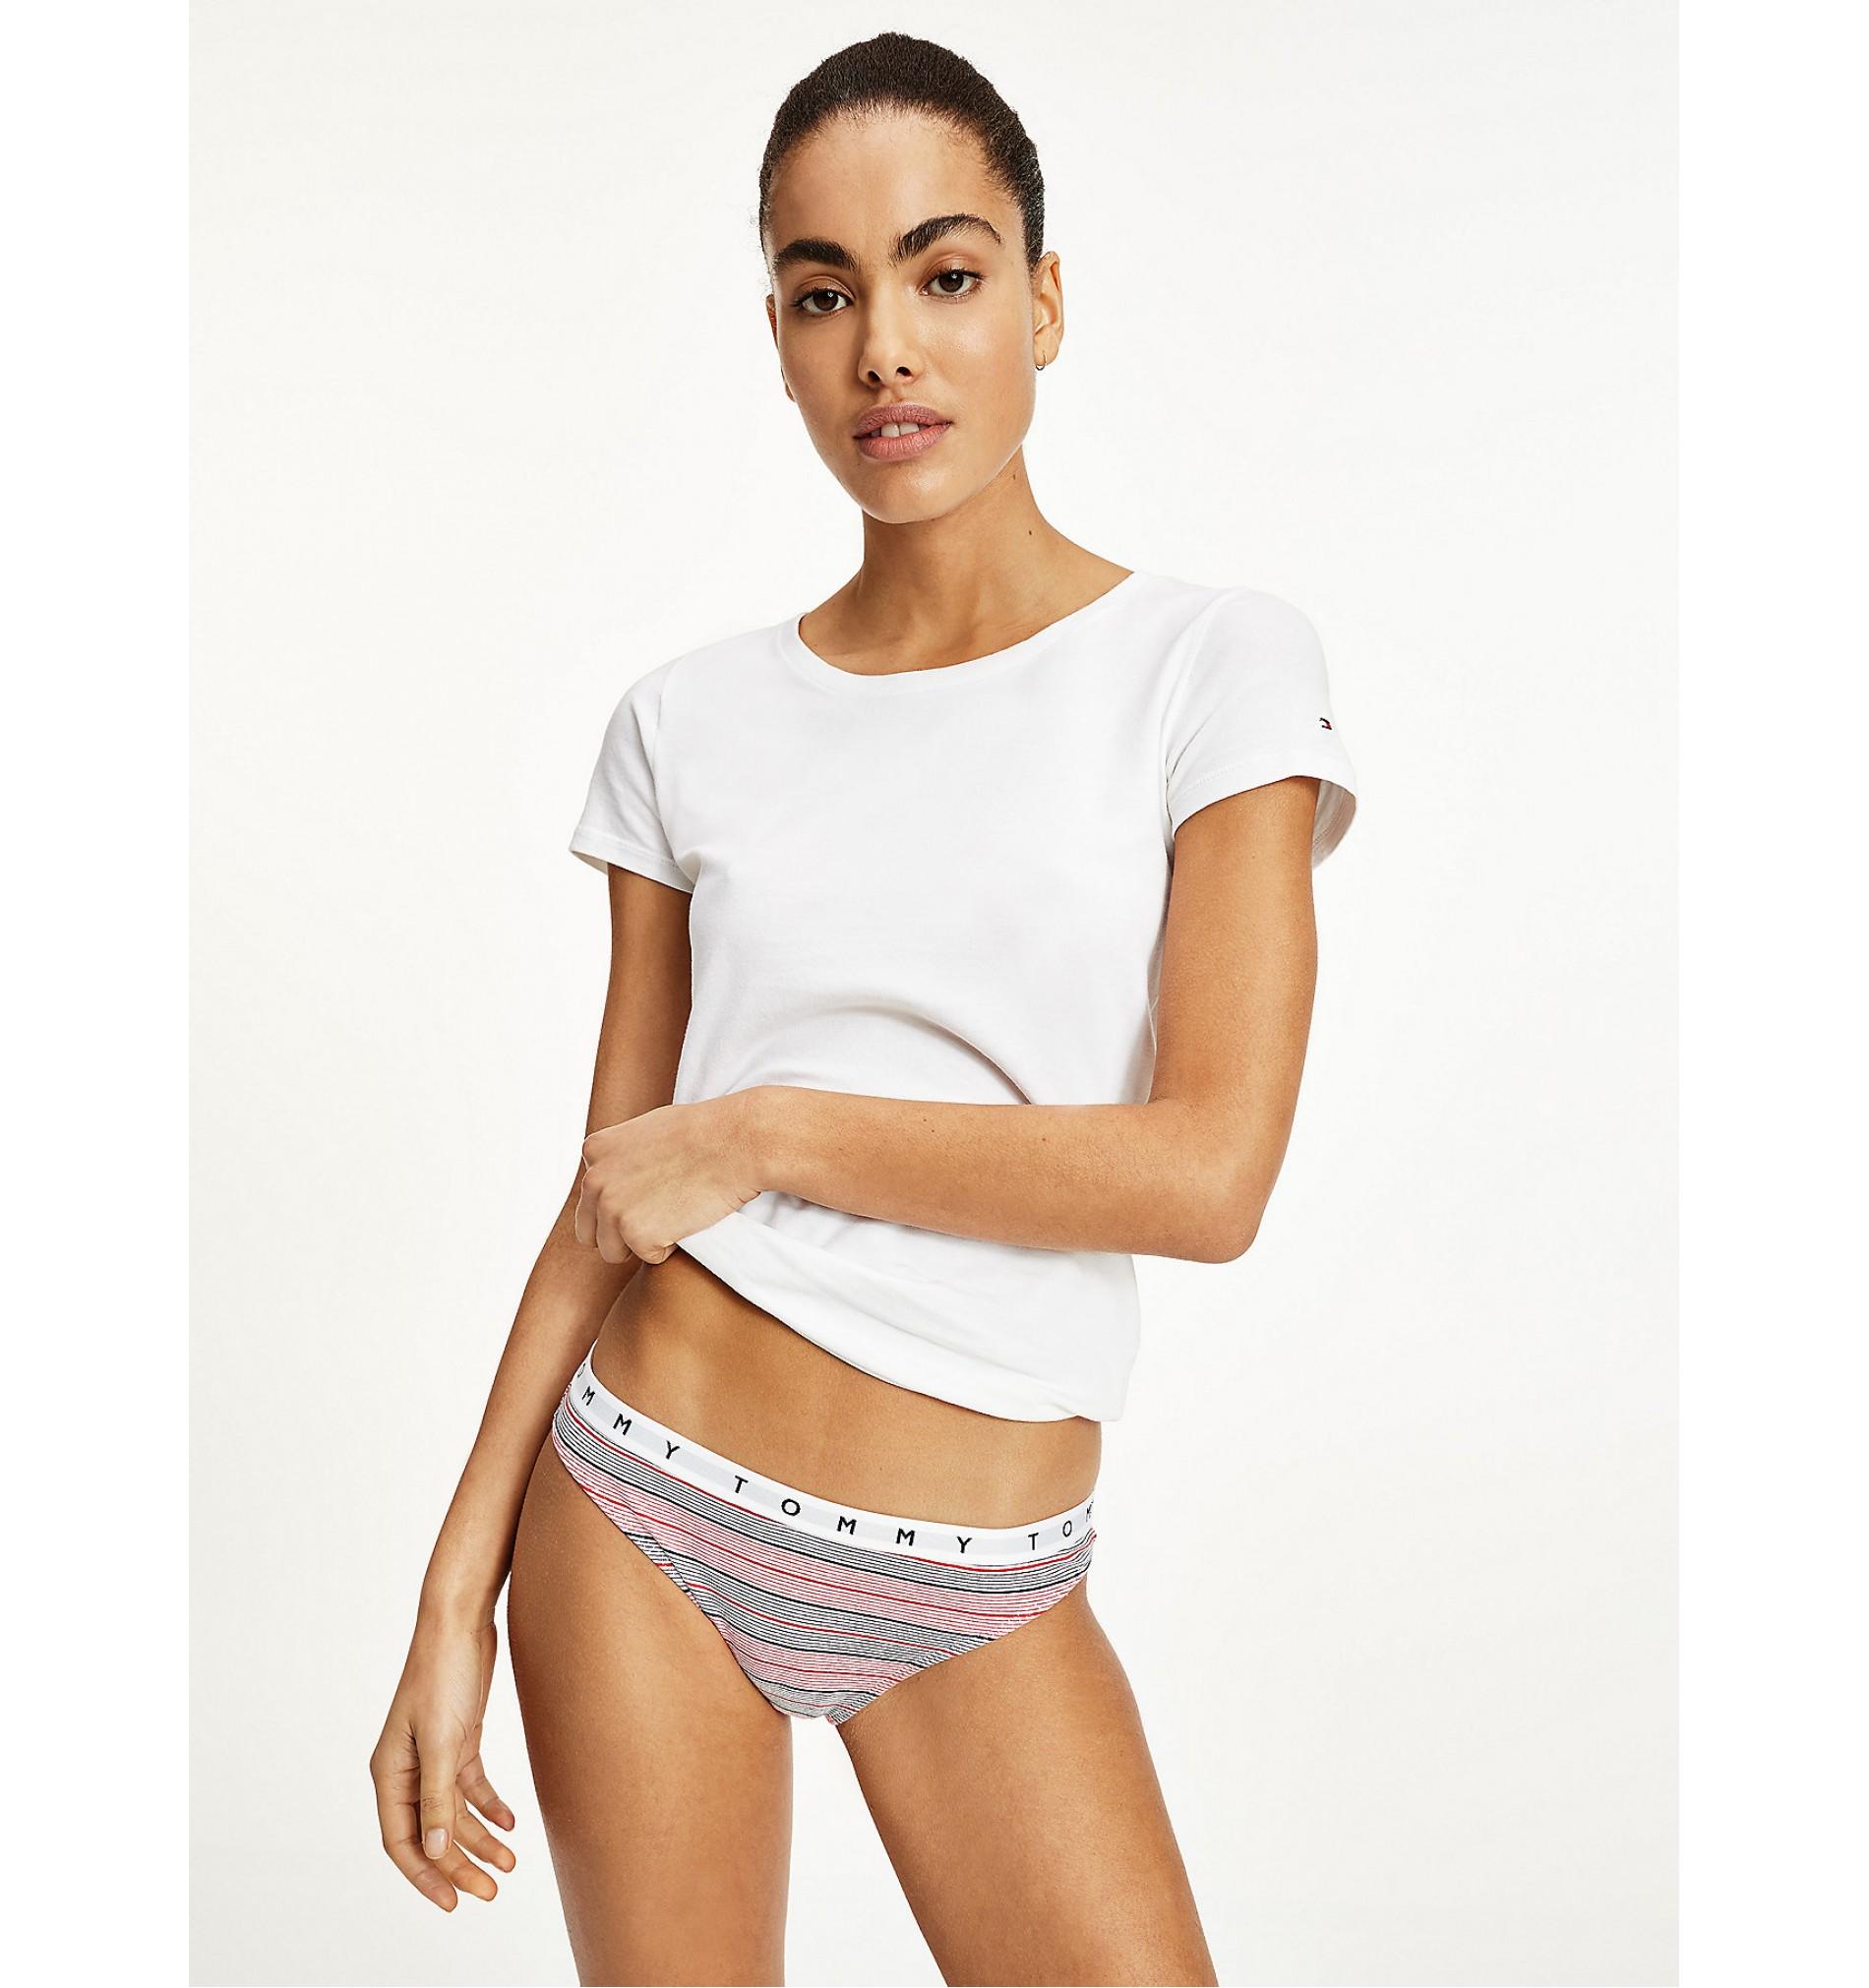 bikini - 3PACK 'ORGANIC COTTON' biela,čierna,pásikavá  0W2